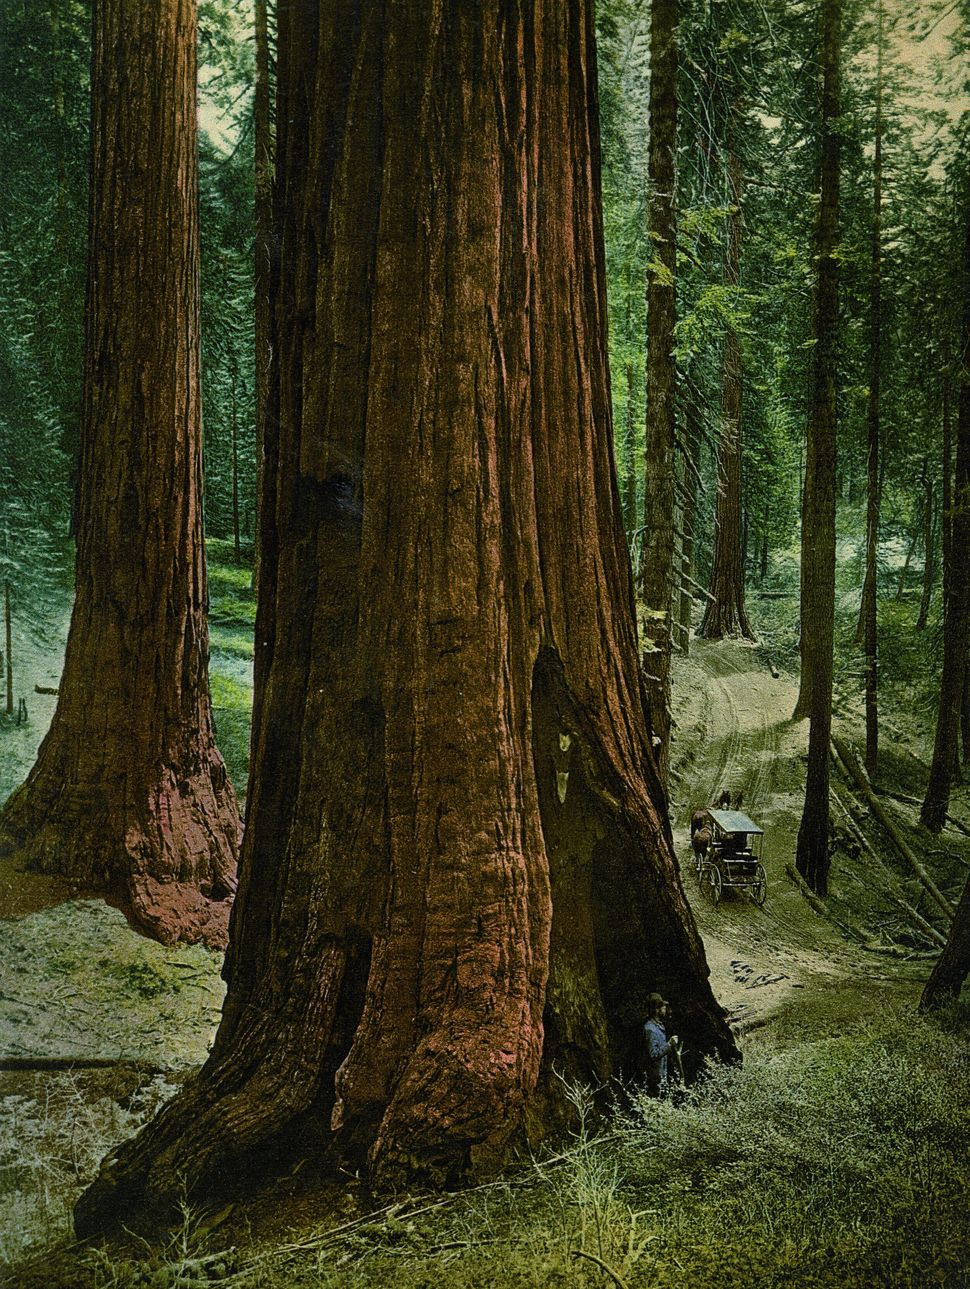 Mariposa Grove, 'Three Graces', Yosemite national park, California.